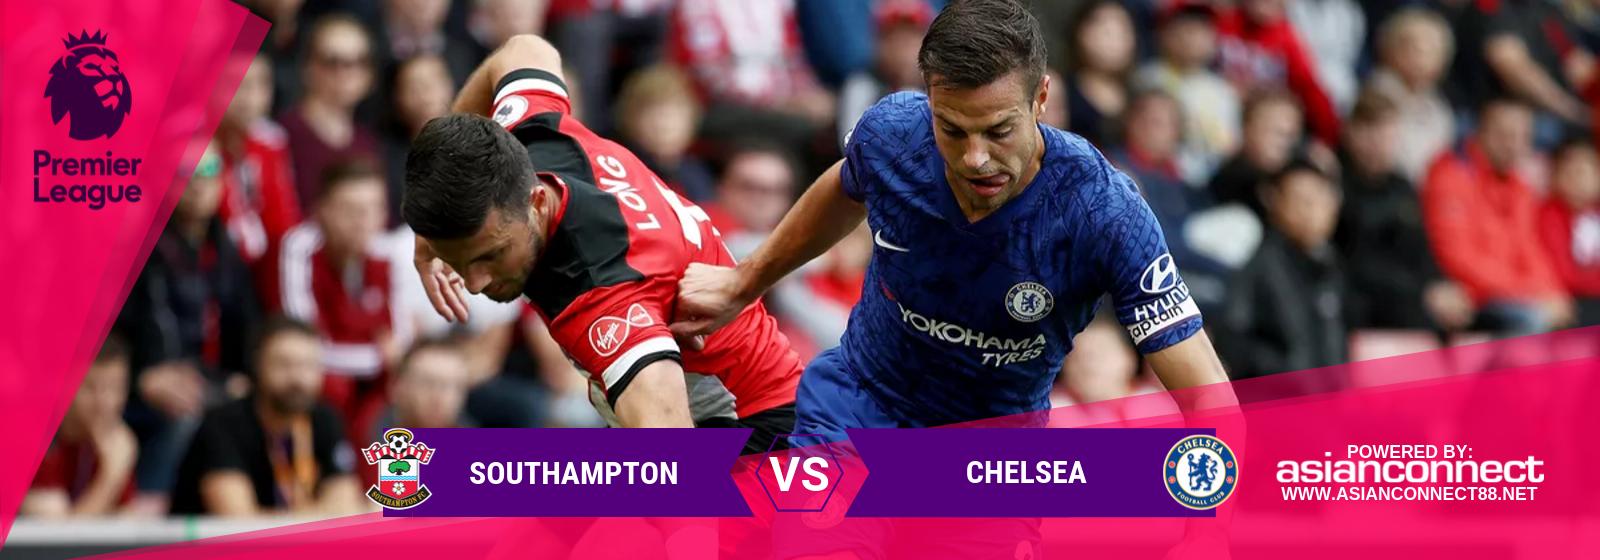 EPL Southampton Vs. Chelsea Asian Connect